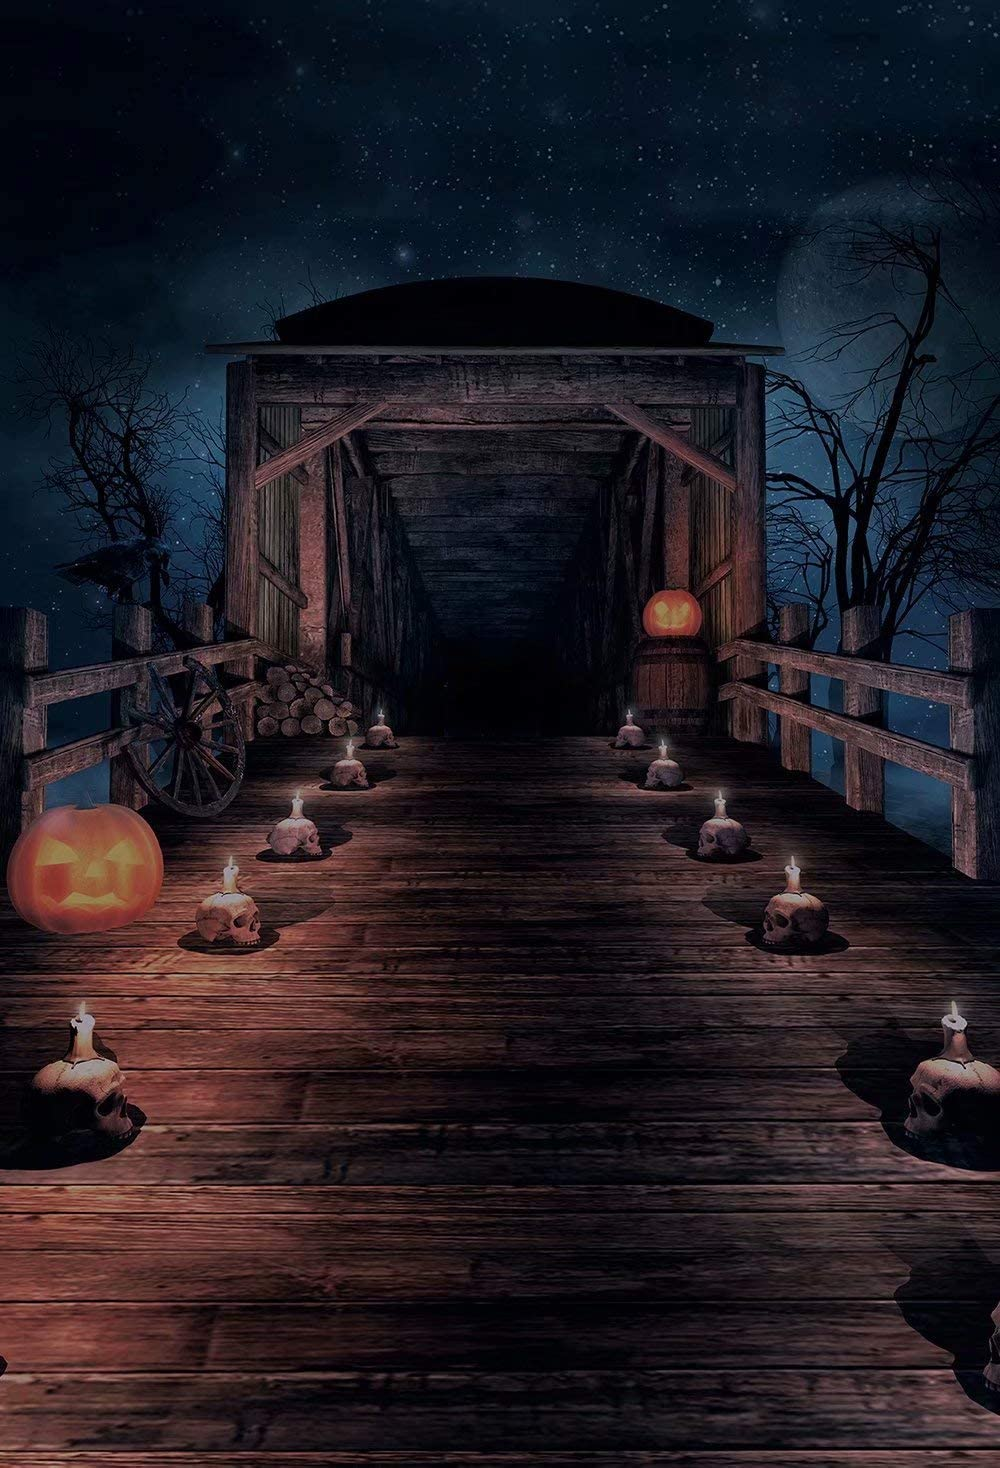 HUAYI Vinyl Halloween Backdrop Pumpkin Lantern Halloween Horrible Gallery Decoration Night Scene Background Photography for Halloween Day Photoshoot Backdrops Studio Props US-W-168-5/×7ft